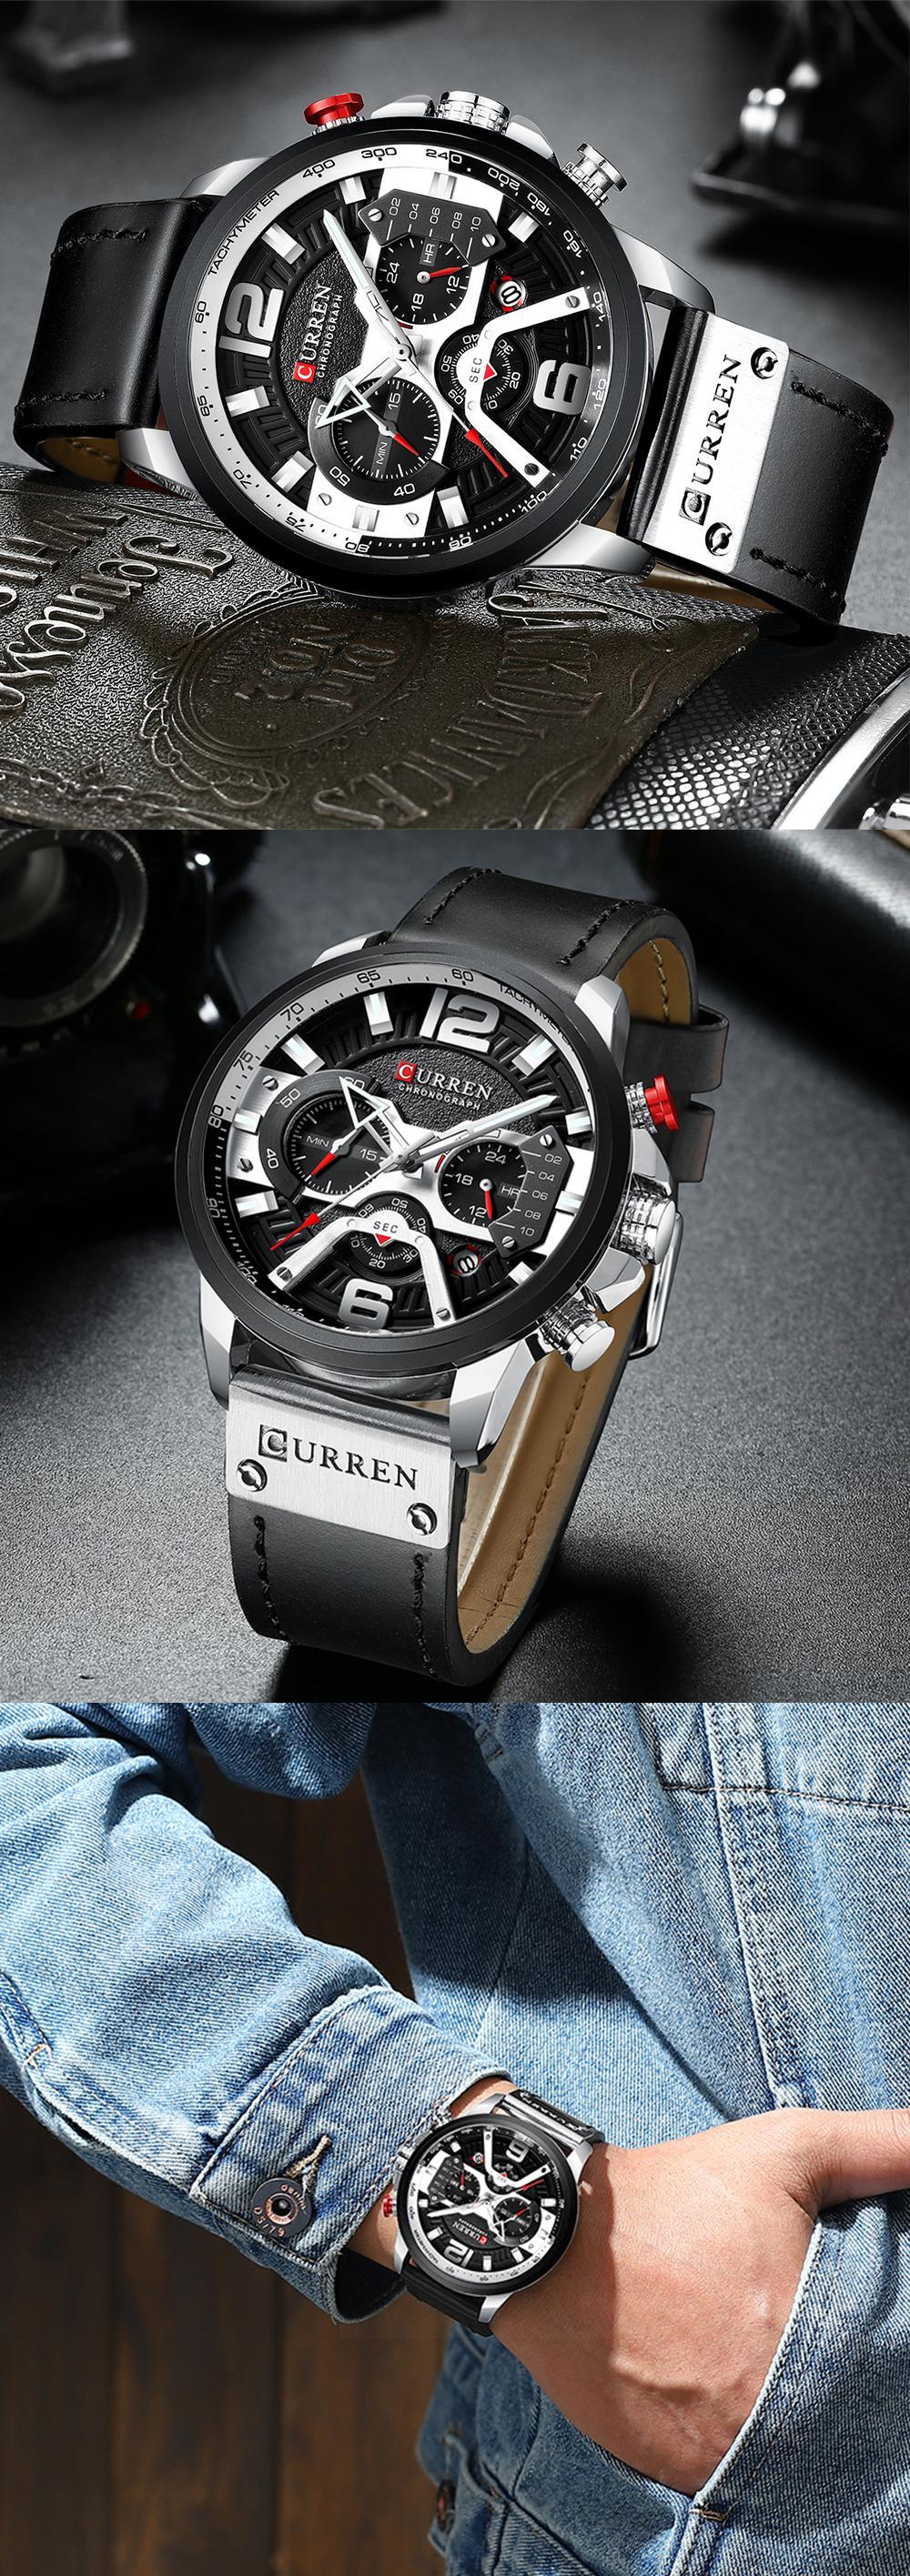 HTB1Wu67LFzqK1RjSZFvq6AB7VXal CURREN Relogio Masculino Sport Watch Men Top Brand Luxury Quartz Men's Chronograph Date Military Wrist Watches Waterproof 8329